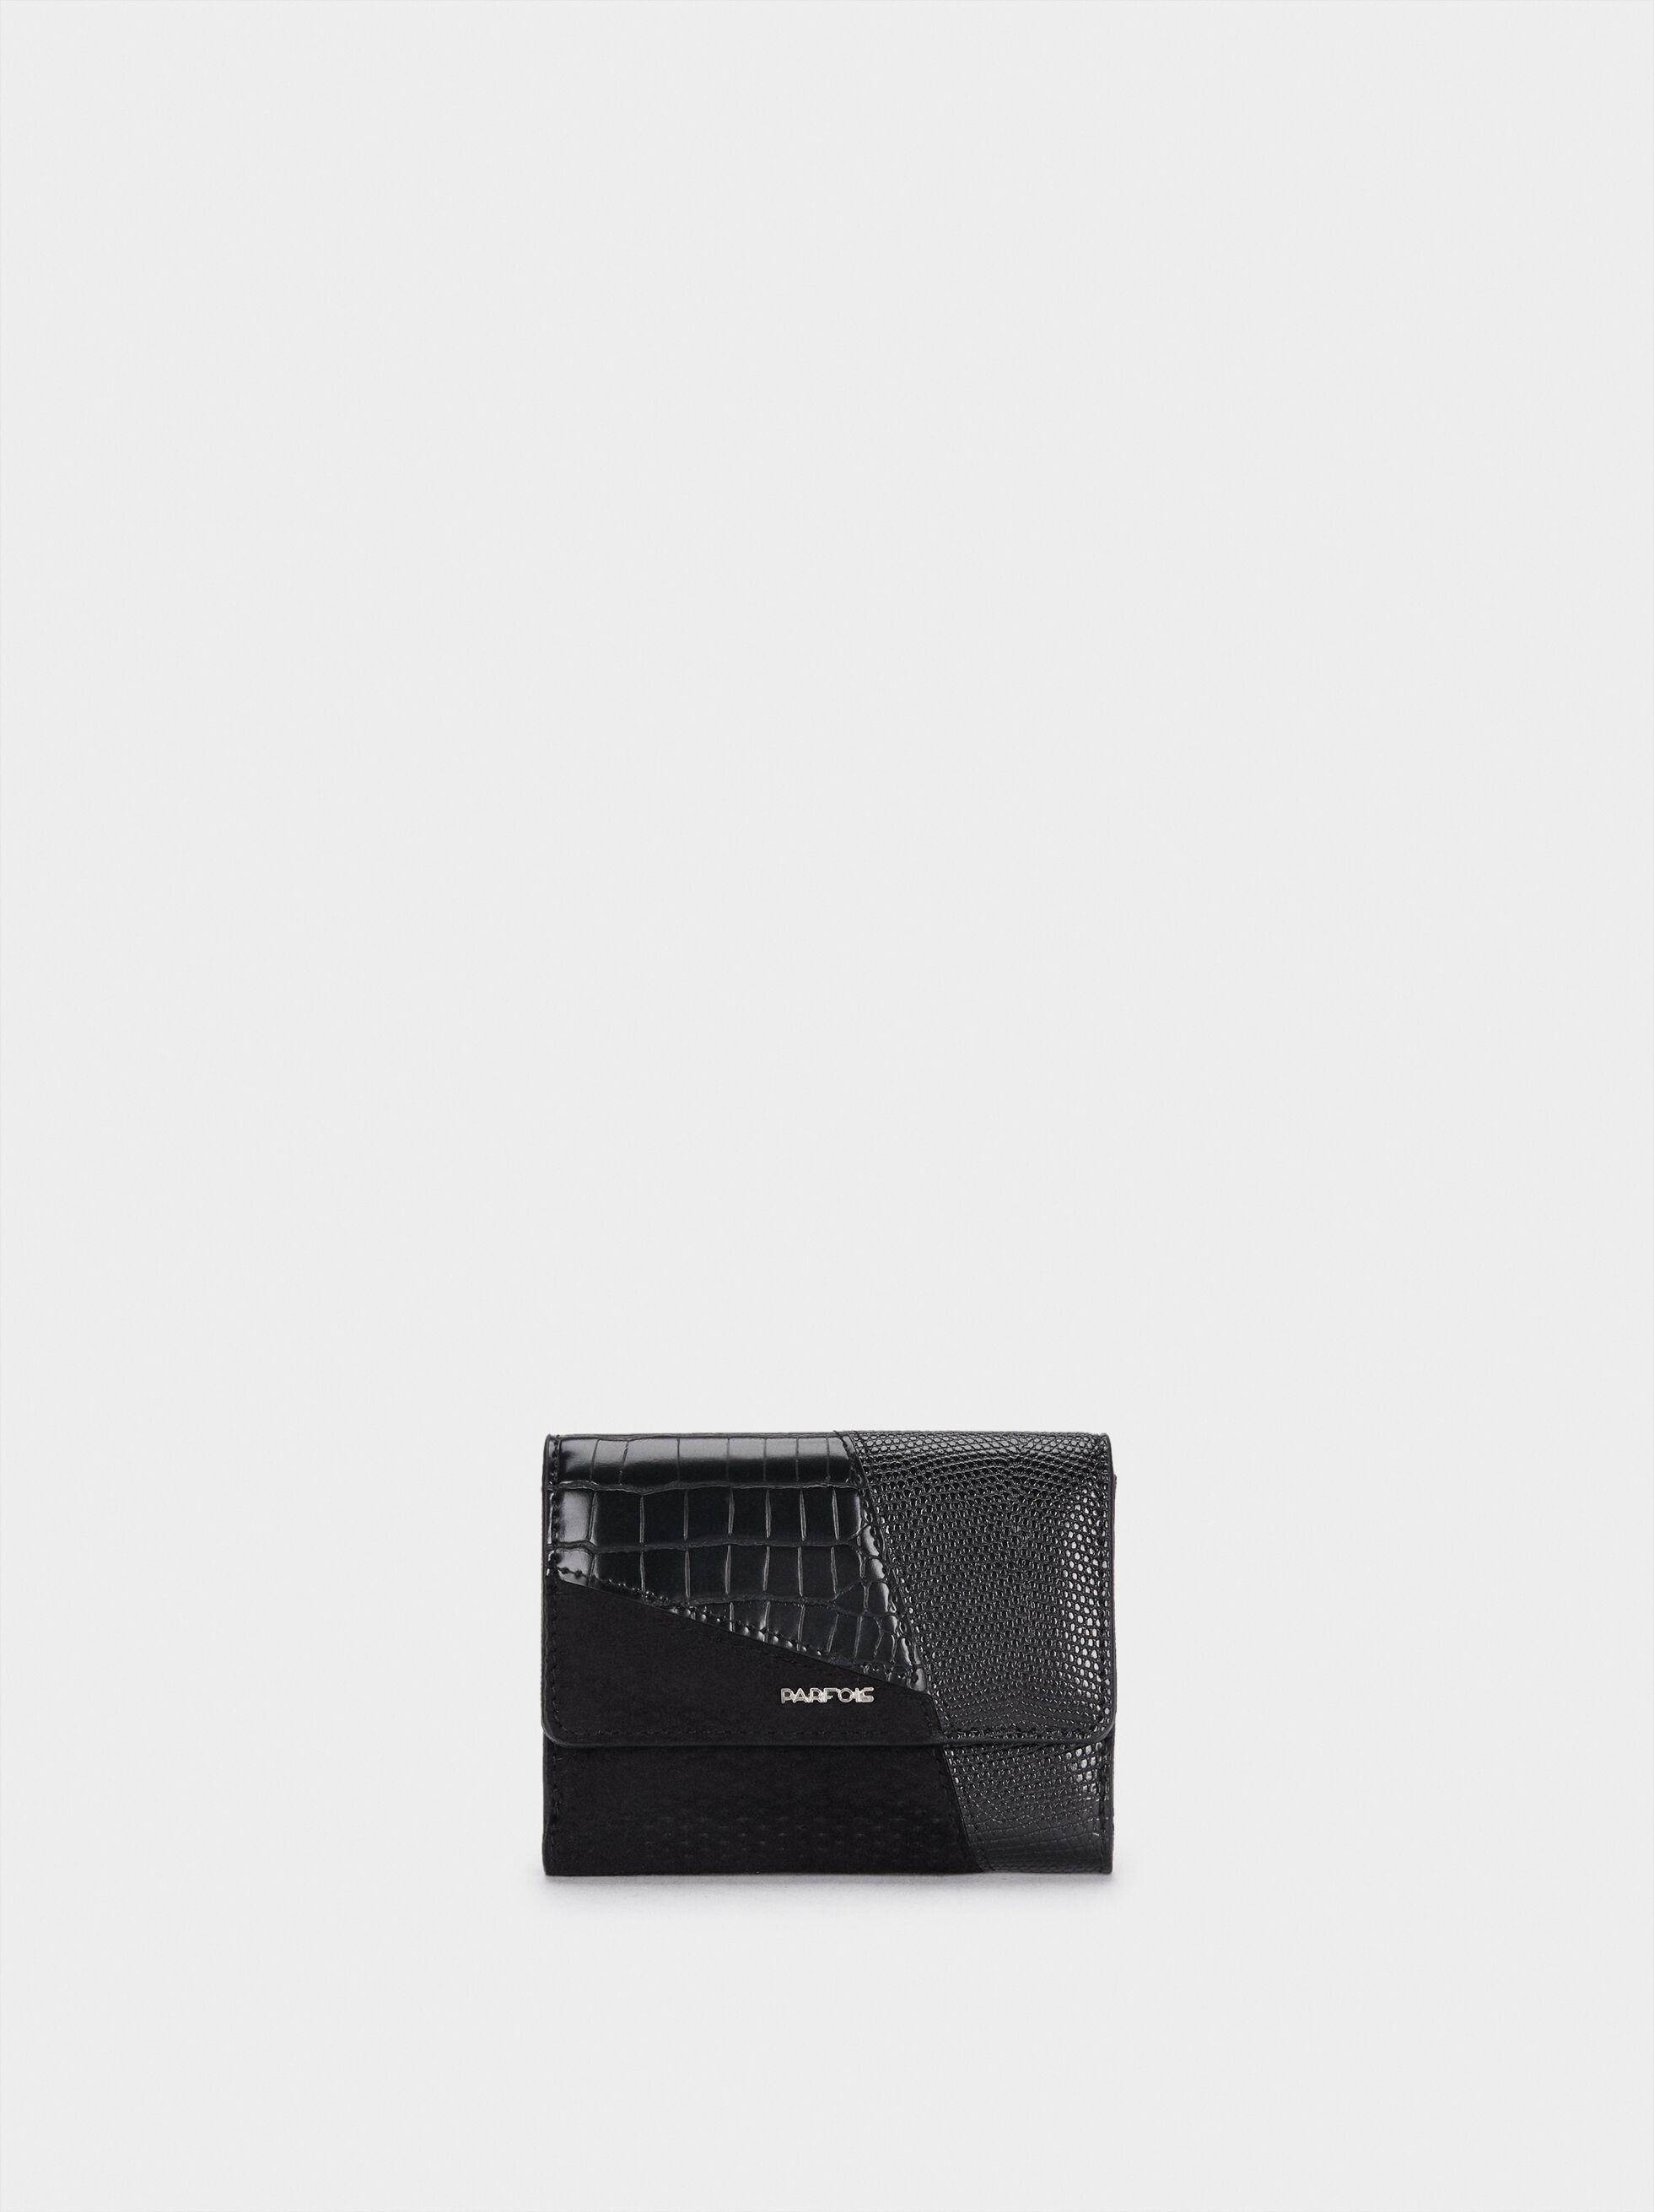 Patchwork Design Purse, Black, hi-res